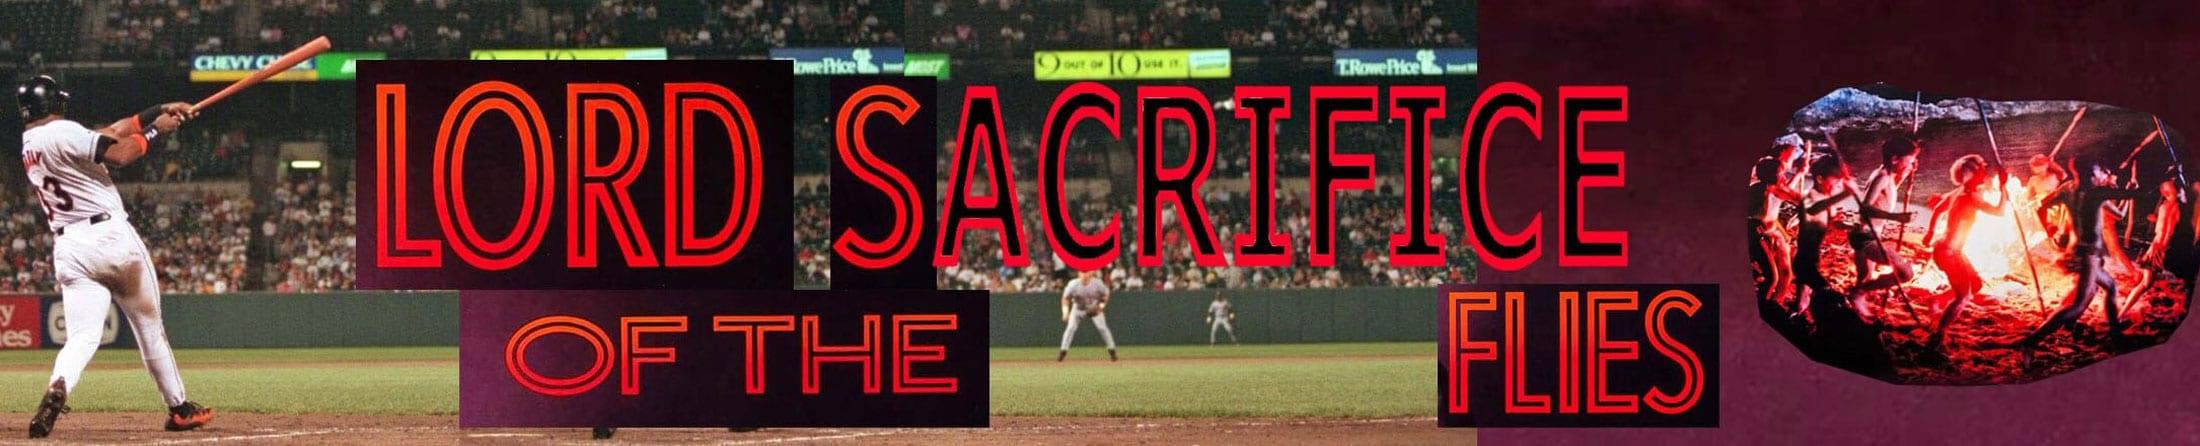 Lord of the Sacrifice Flies, baseball movie